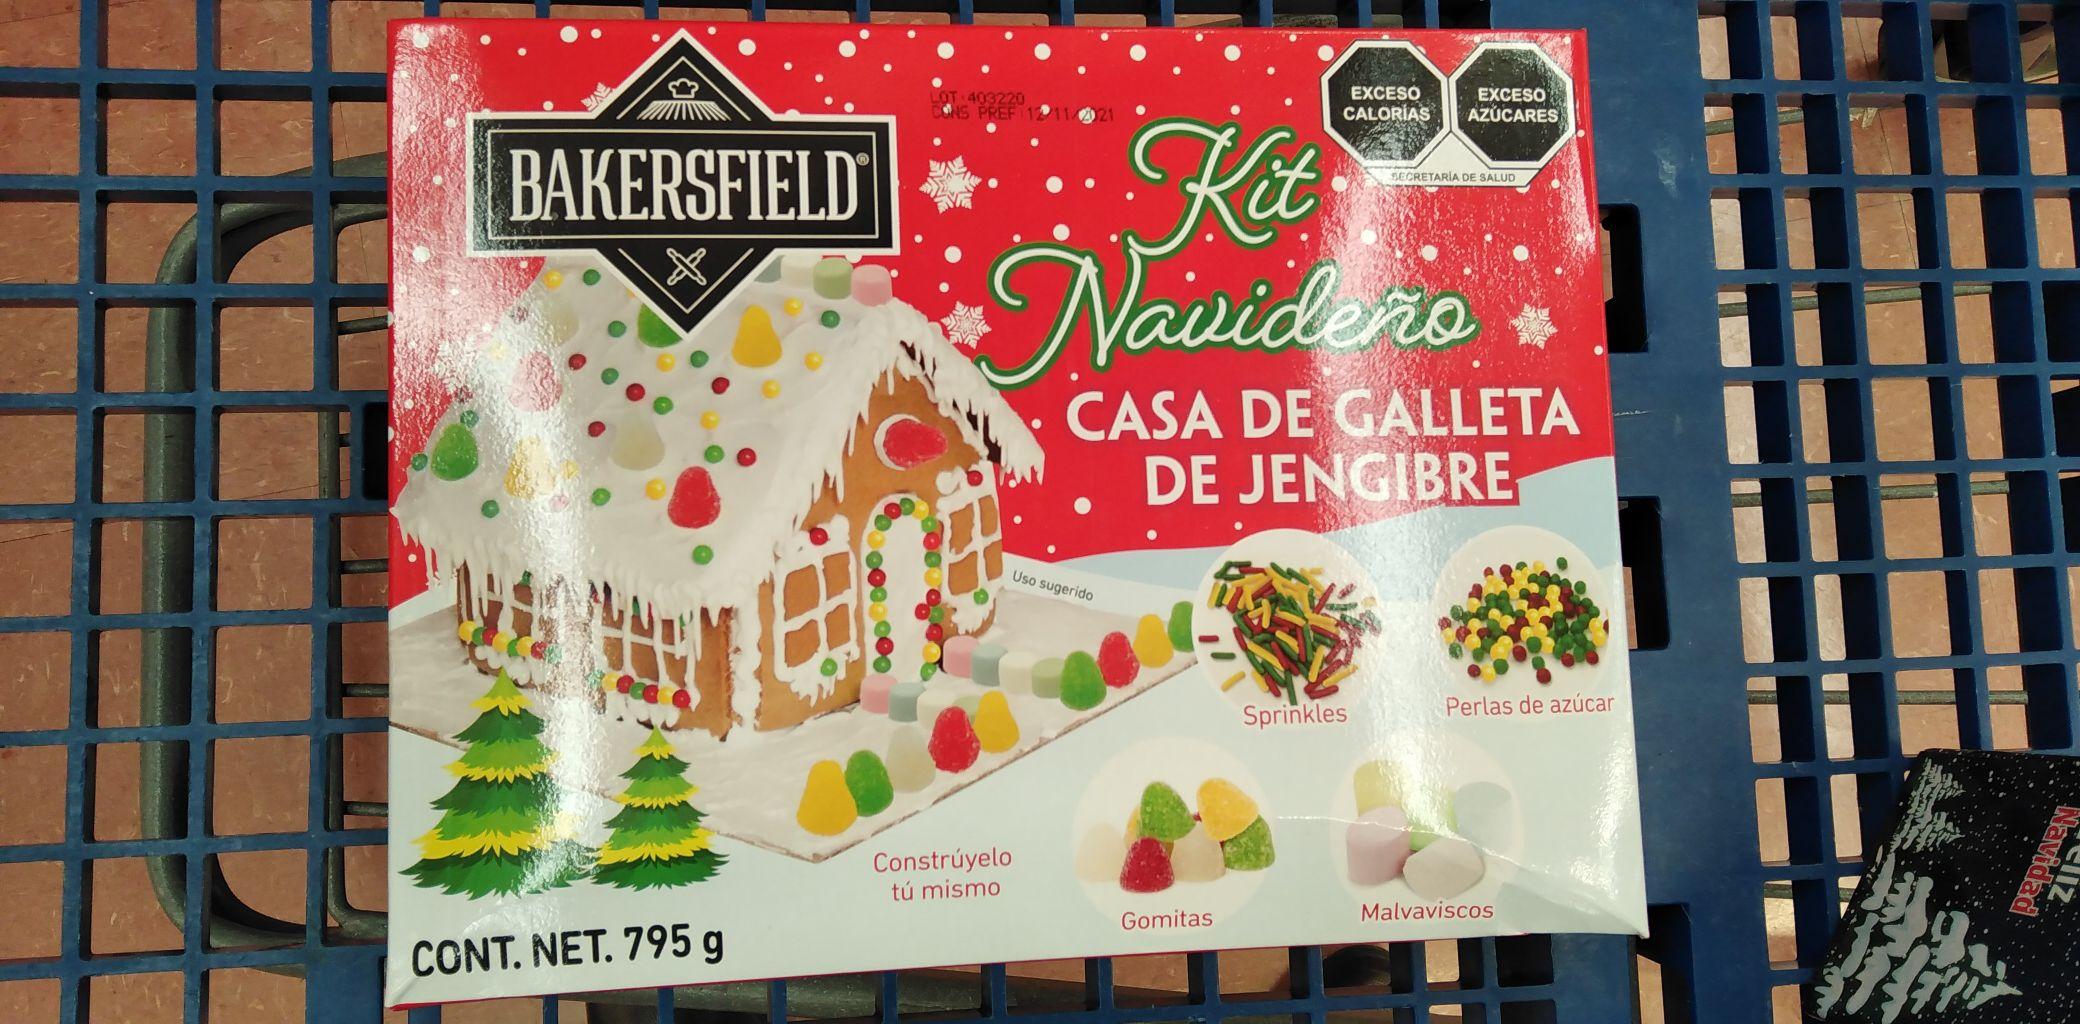 Walmart: kit casa galleta de jengibre